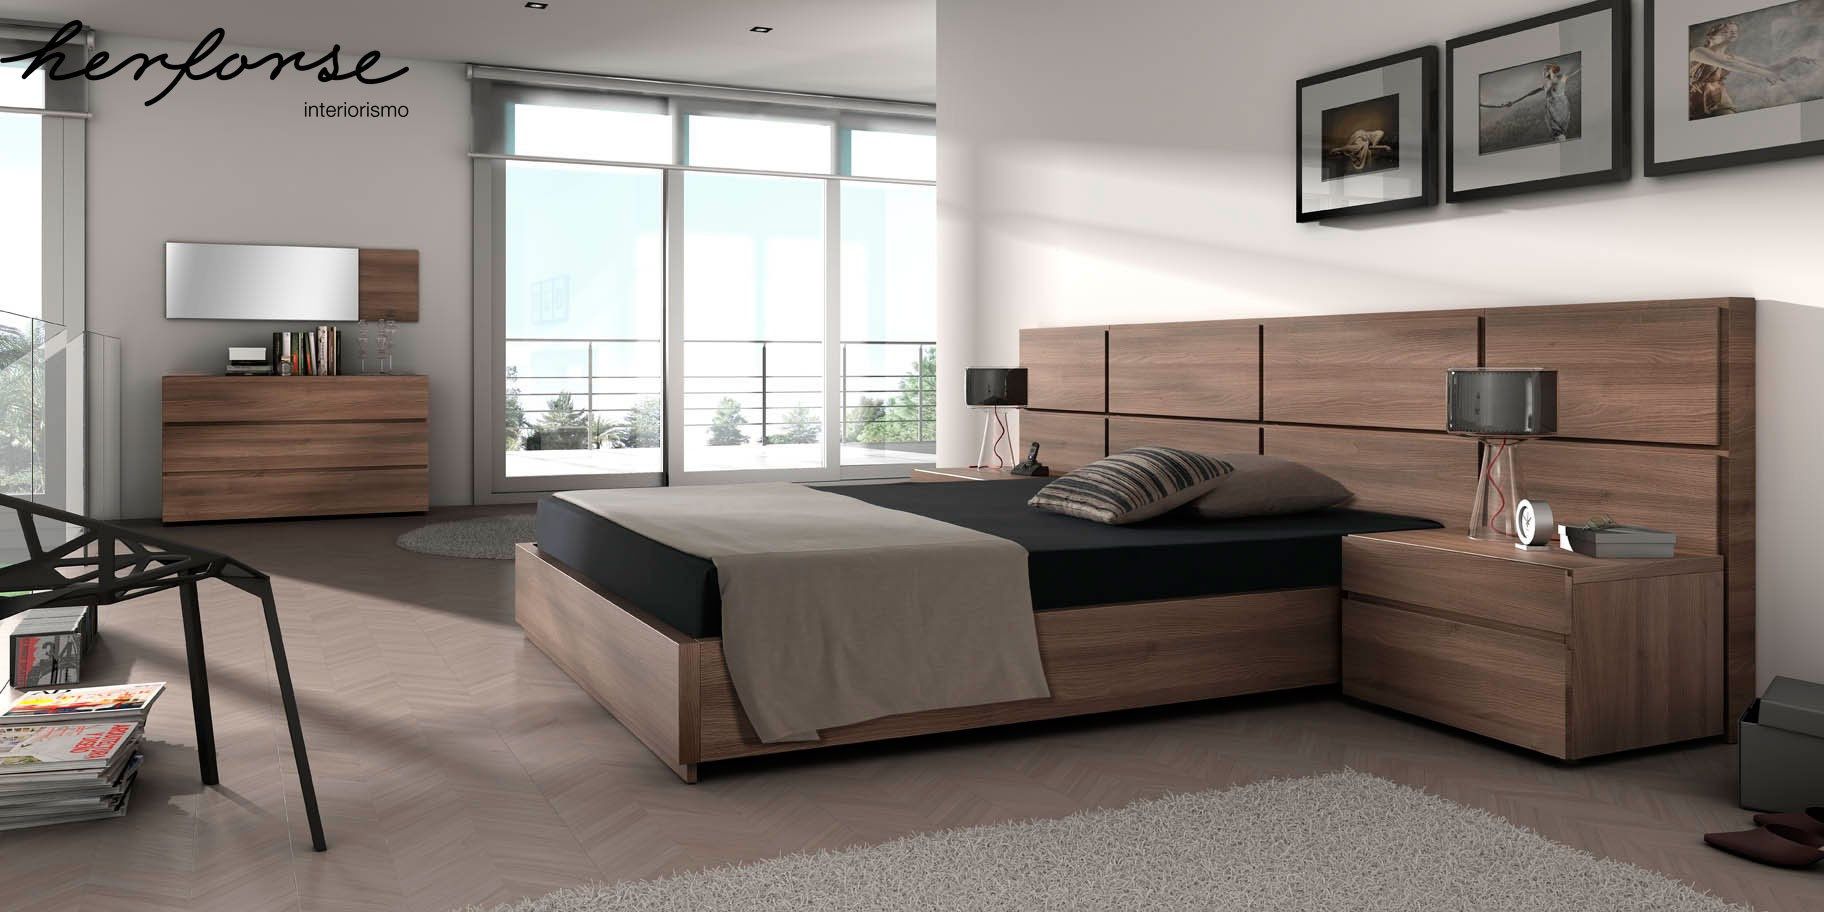 Fotos de dormitorios modernos dormitorios modernos madera for Dormitorios baratos online